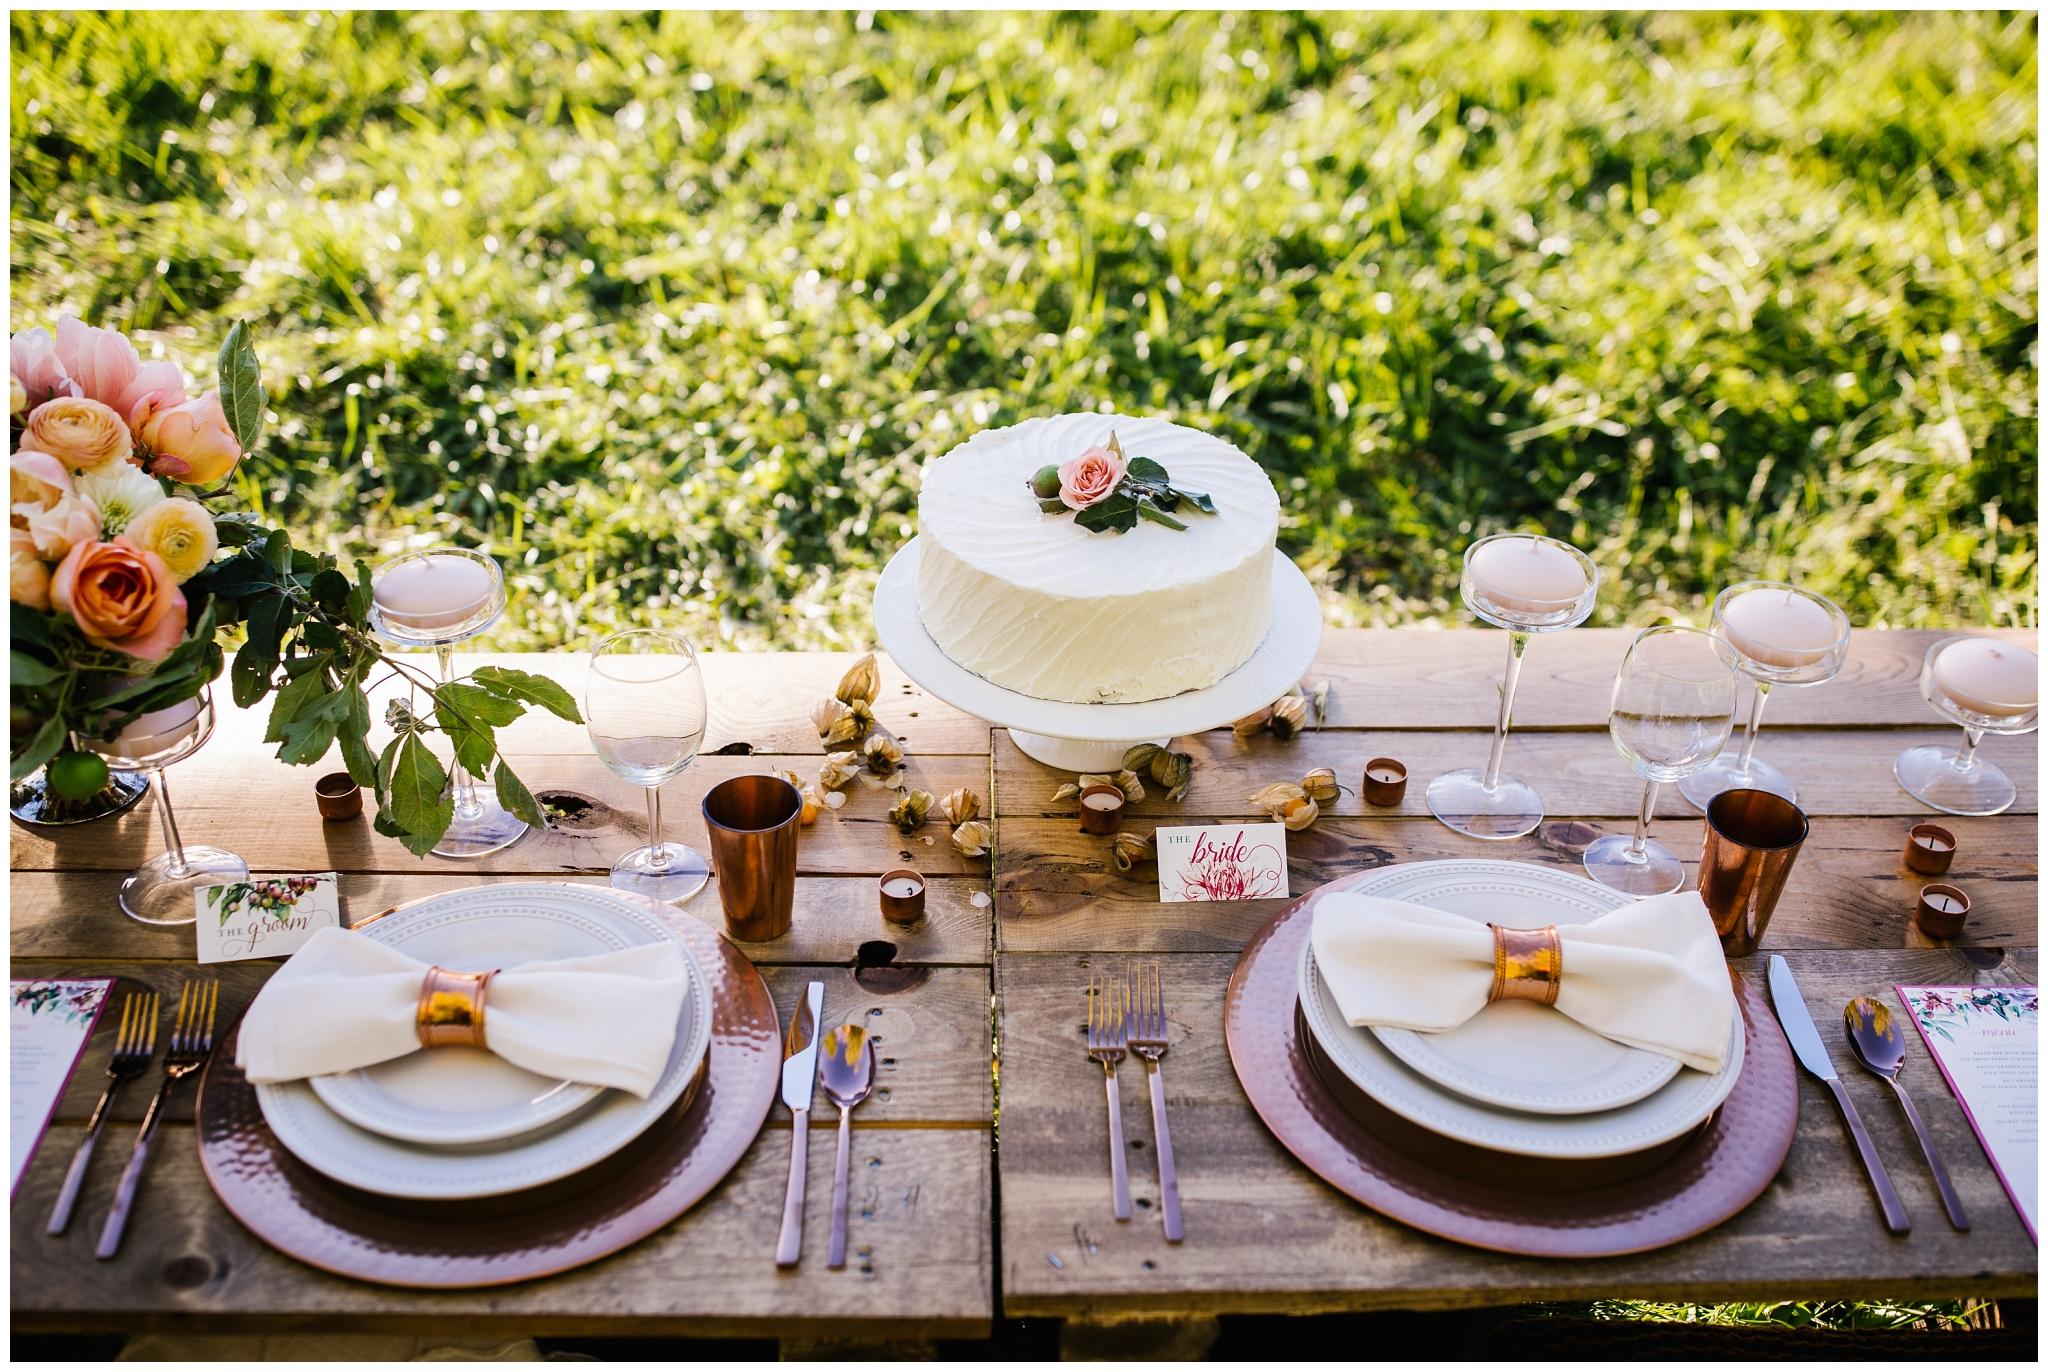 Lizzie-B-Imagery-Utah-Wedding-Photographer-Park-City-Photographer_0025.jpg